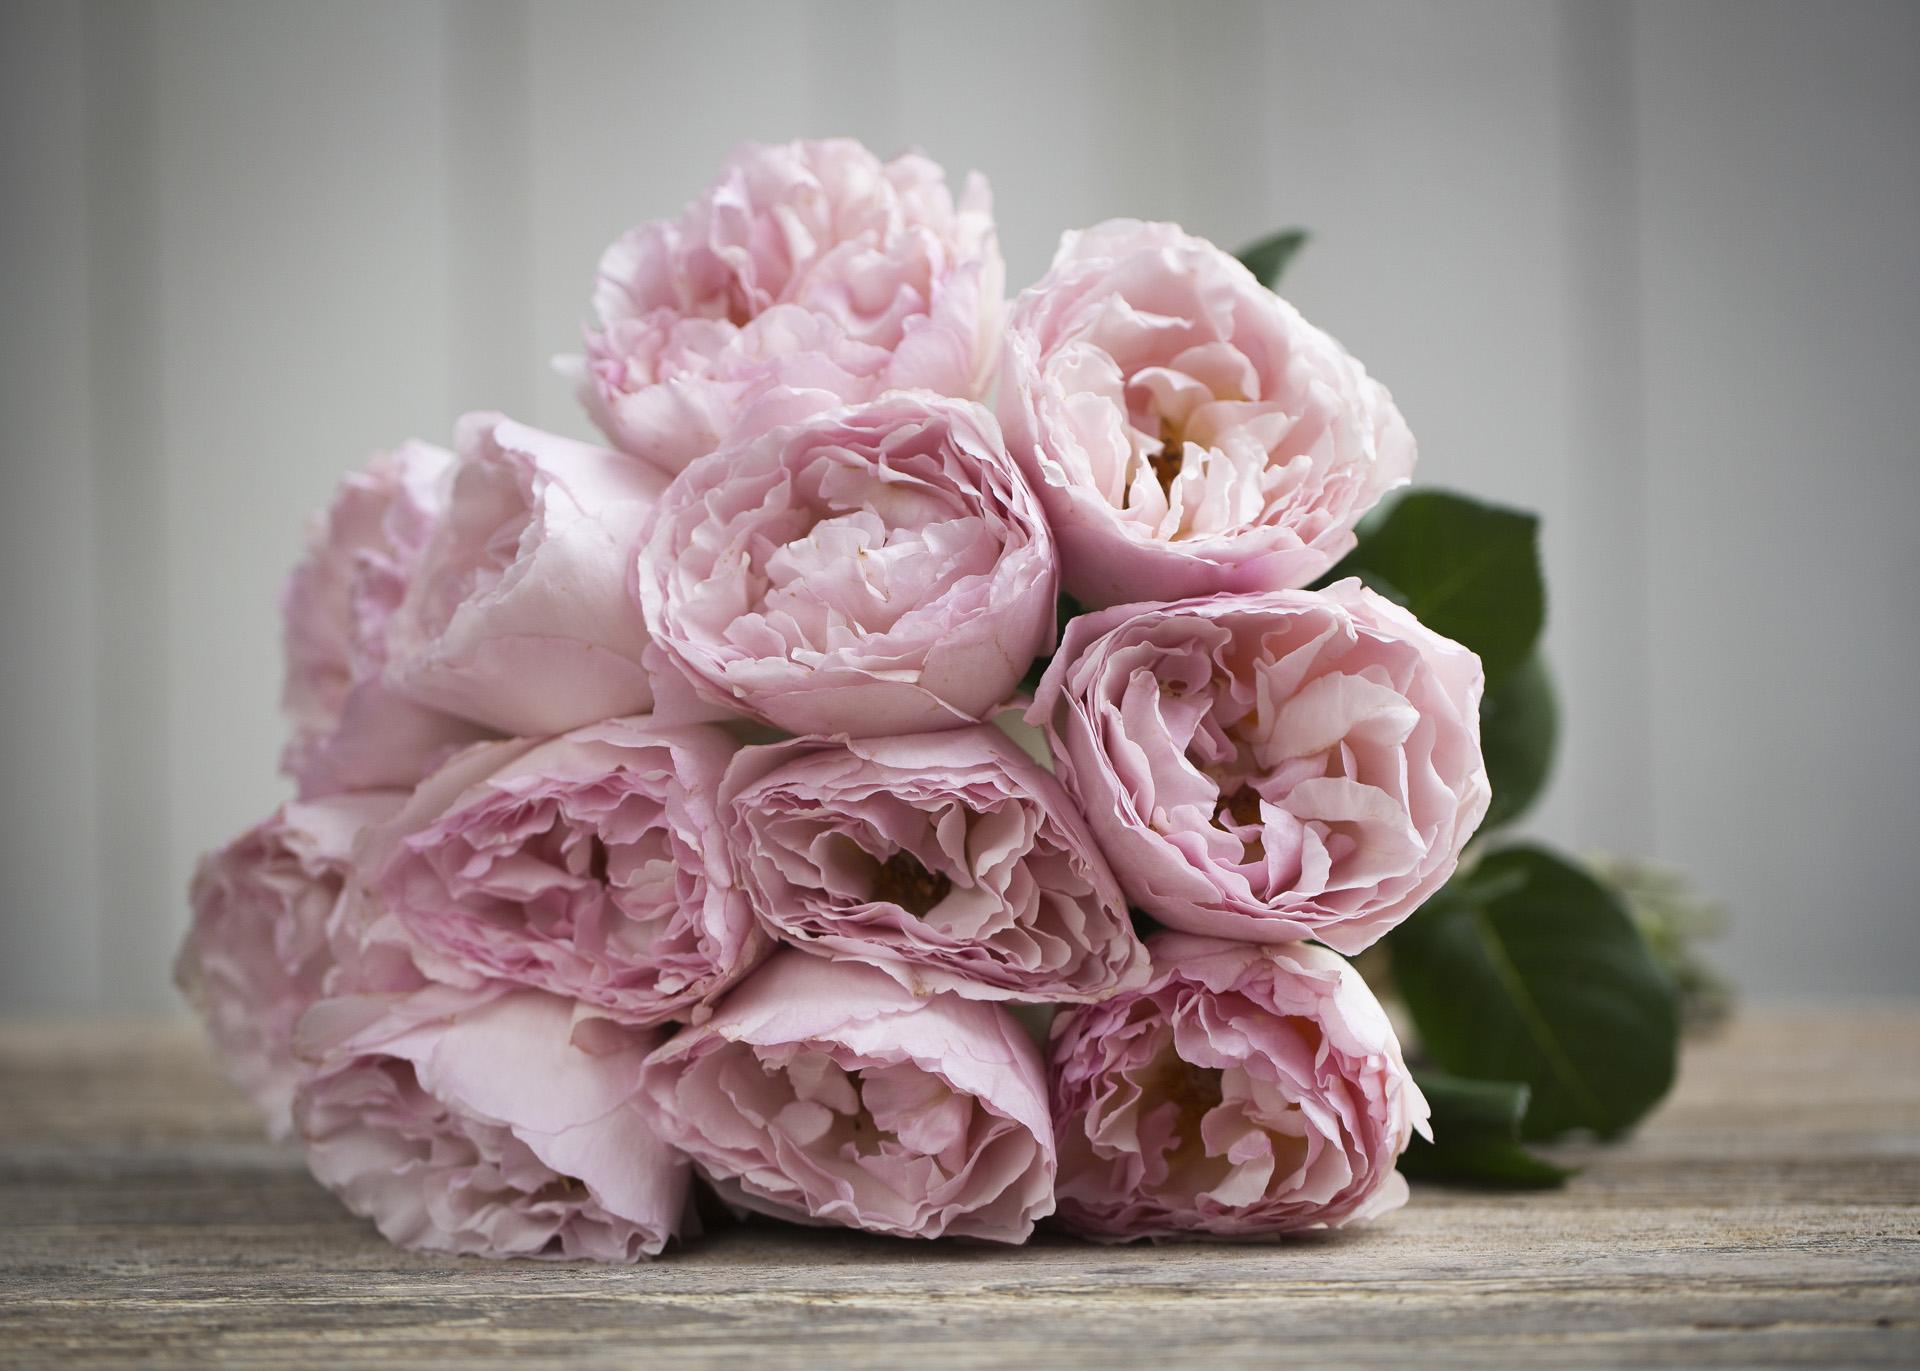 Princesse Charlene de Monaco scented roses